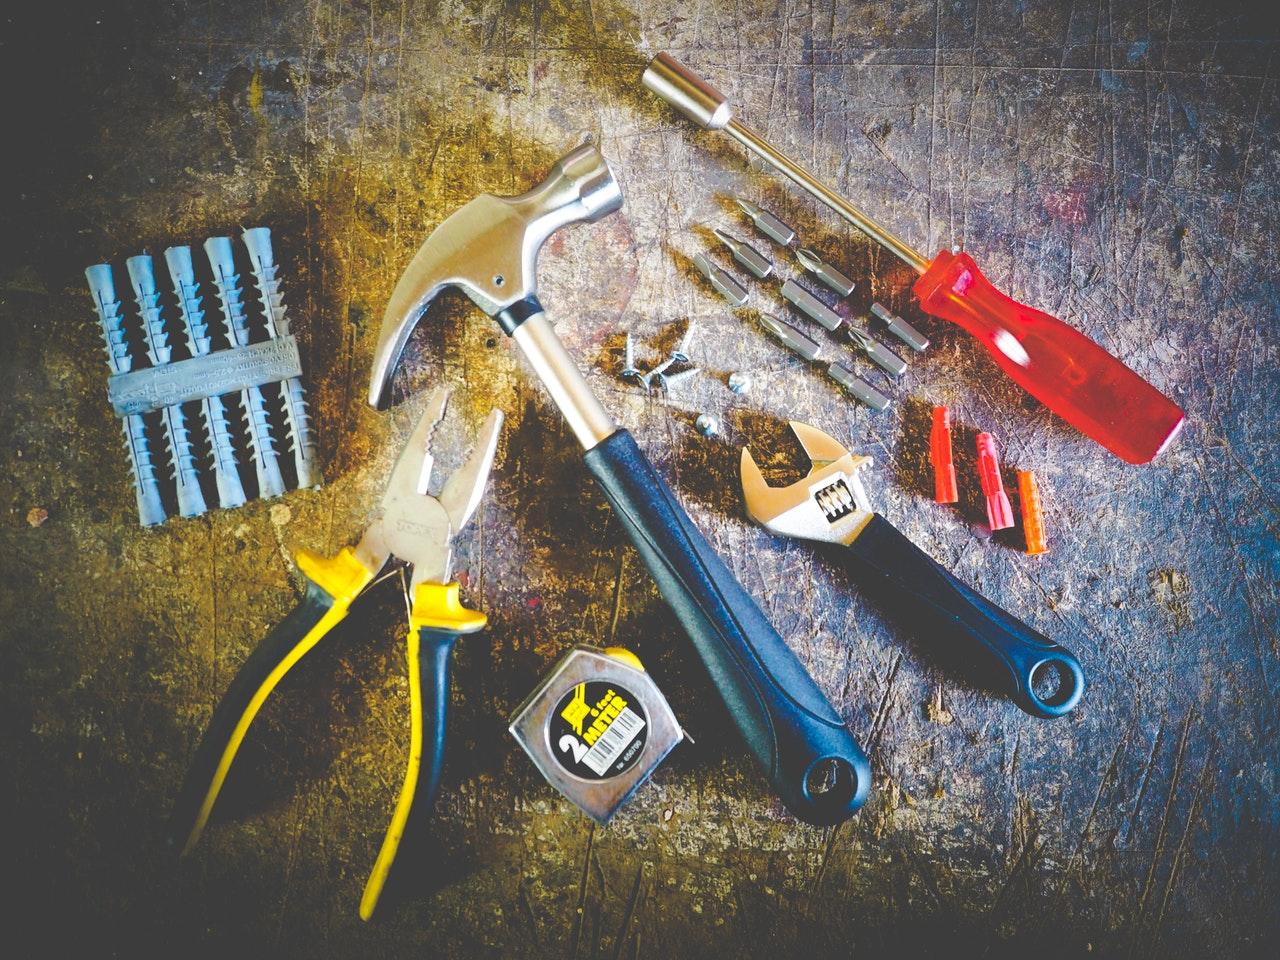 hammer-hand-tools